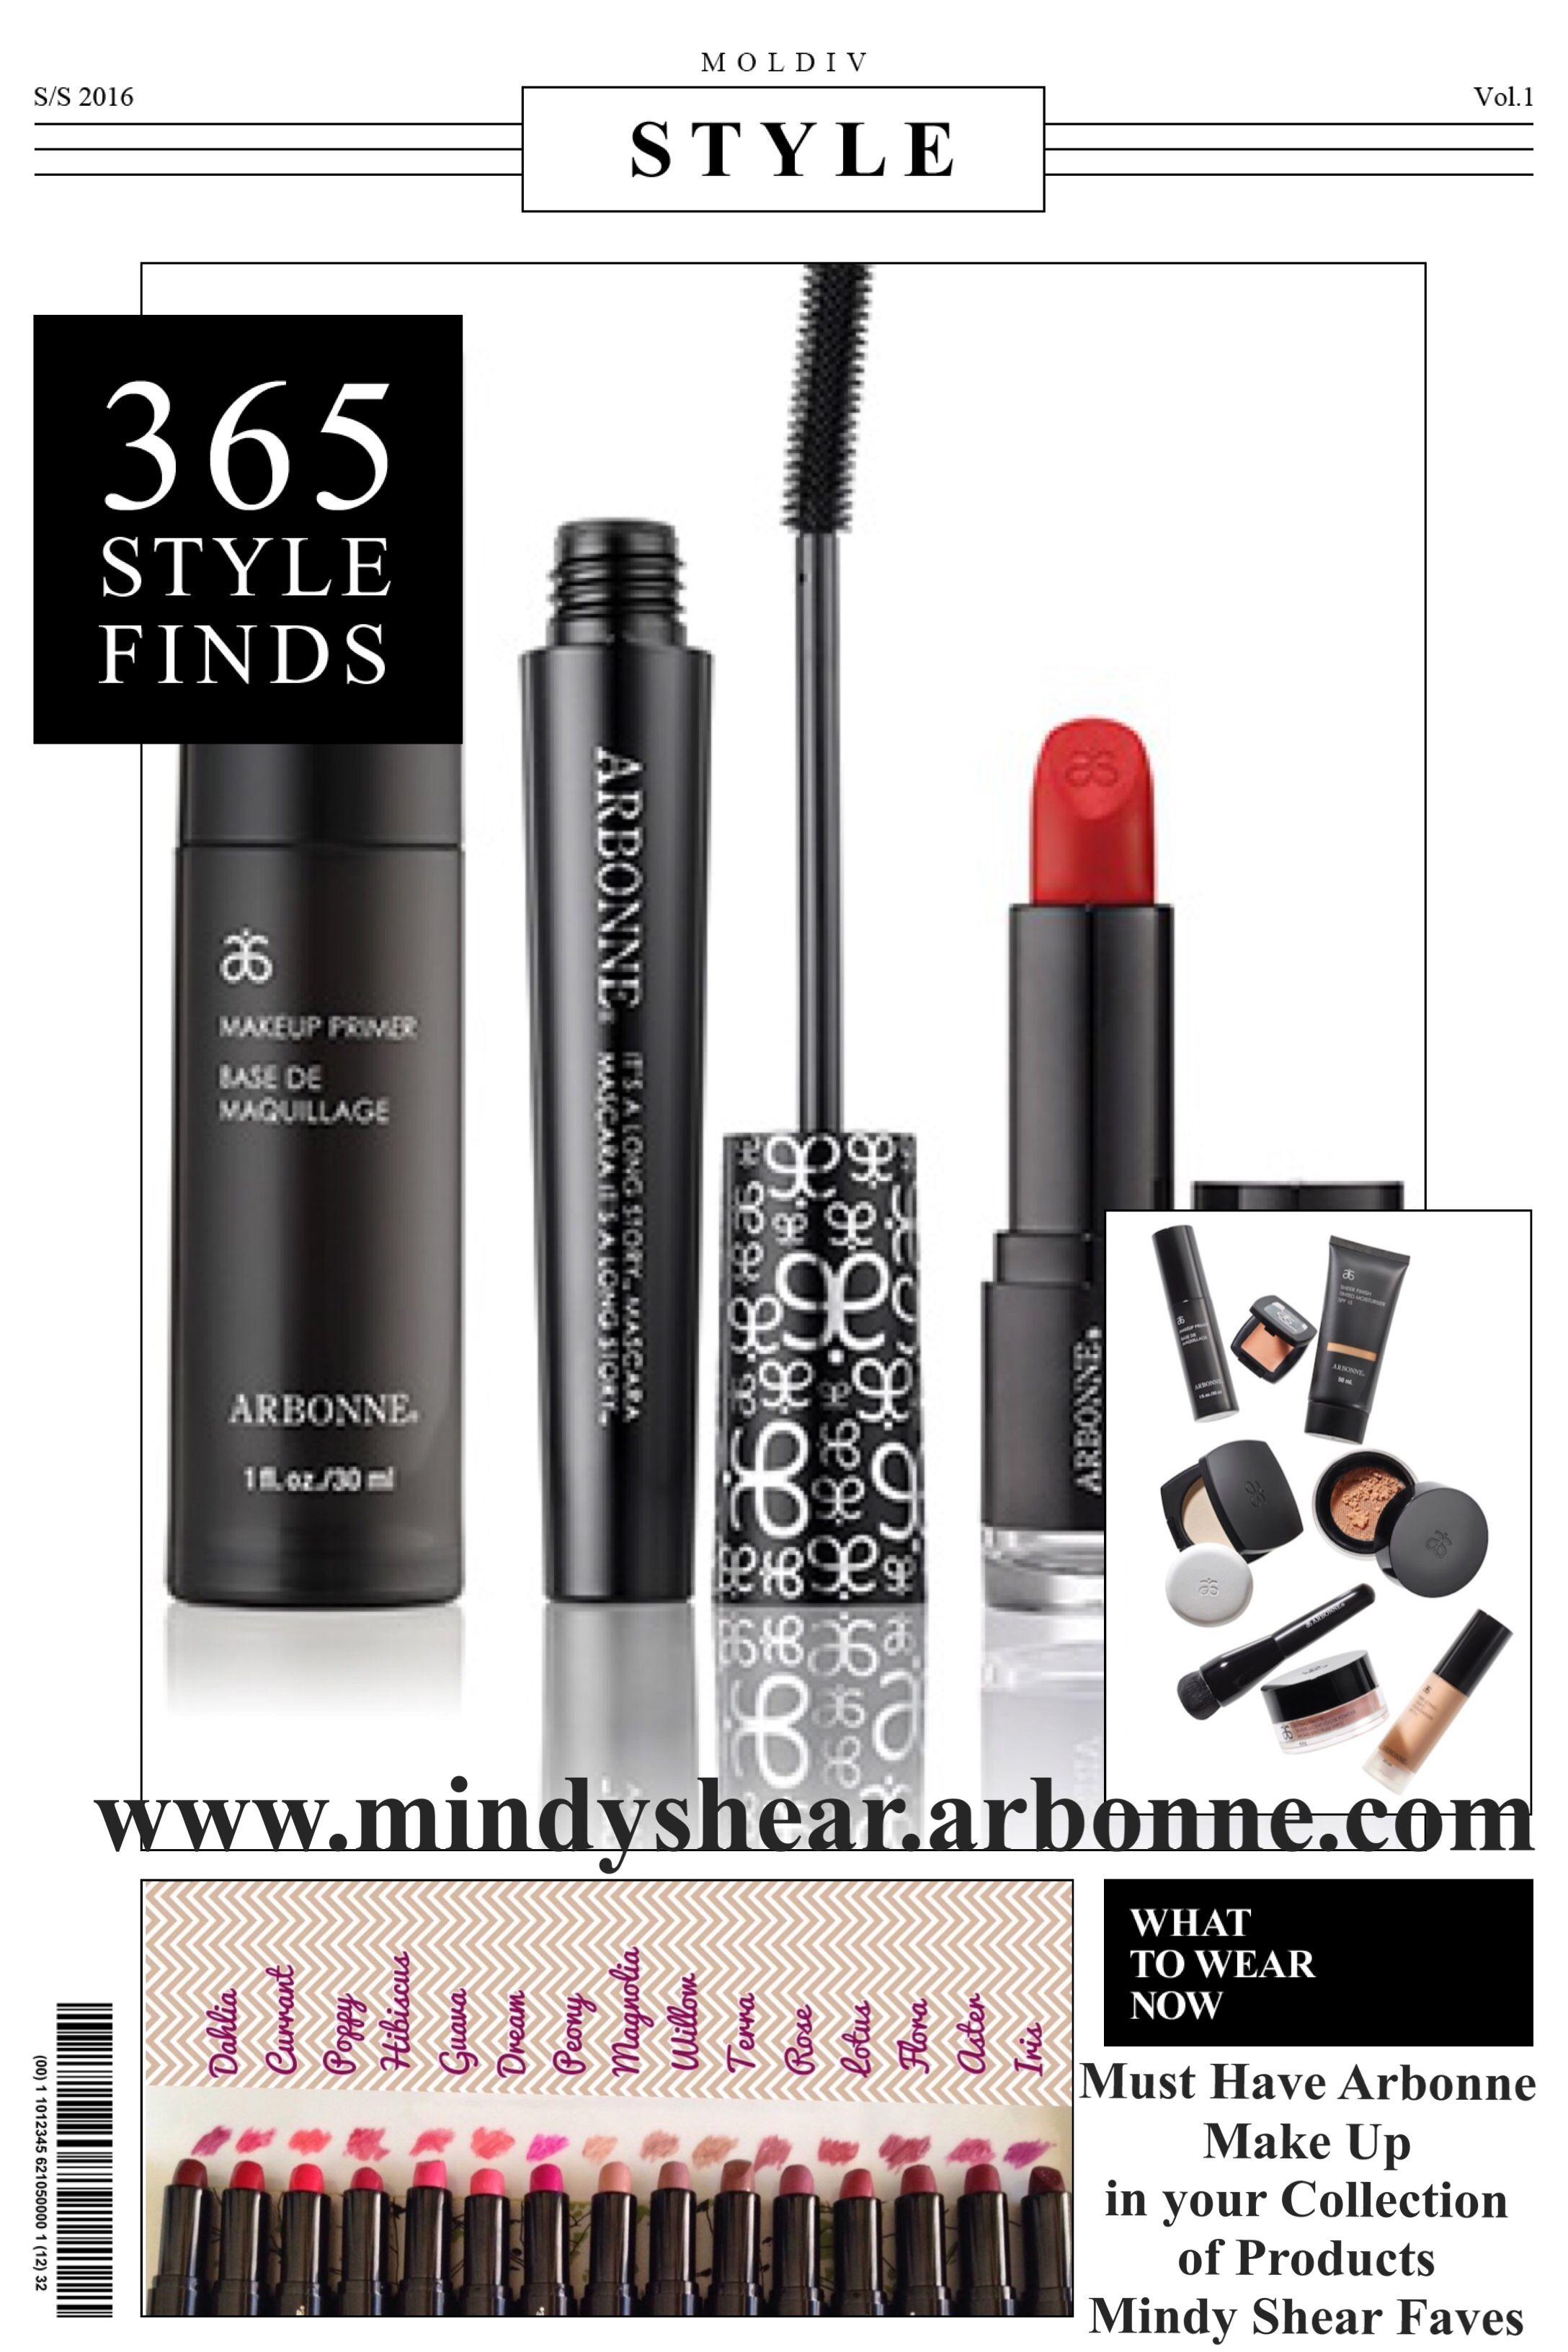 Mindy Shear Faves makeup primer beauty style